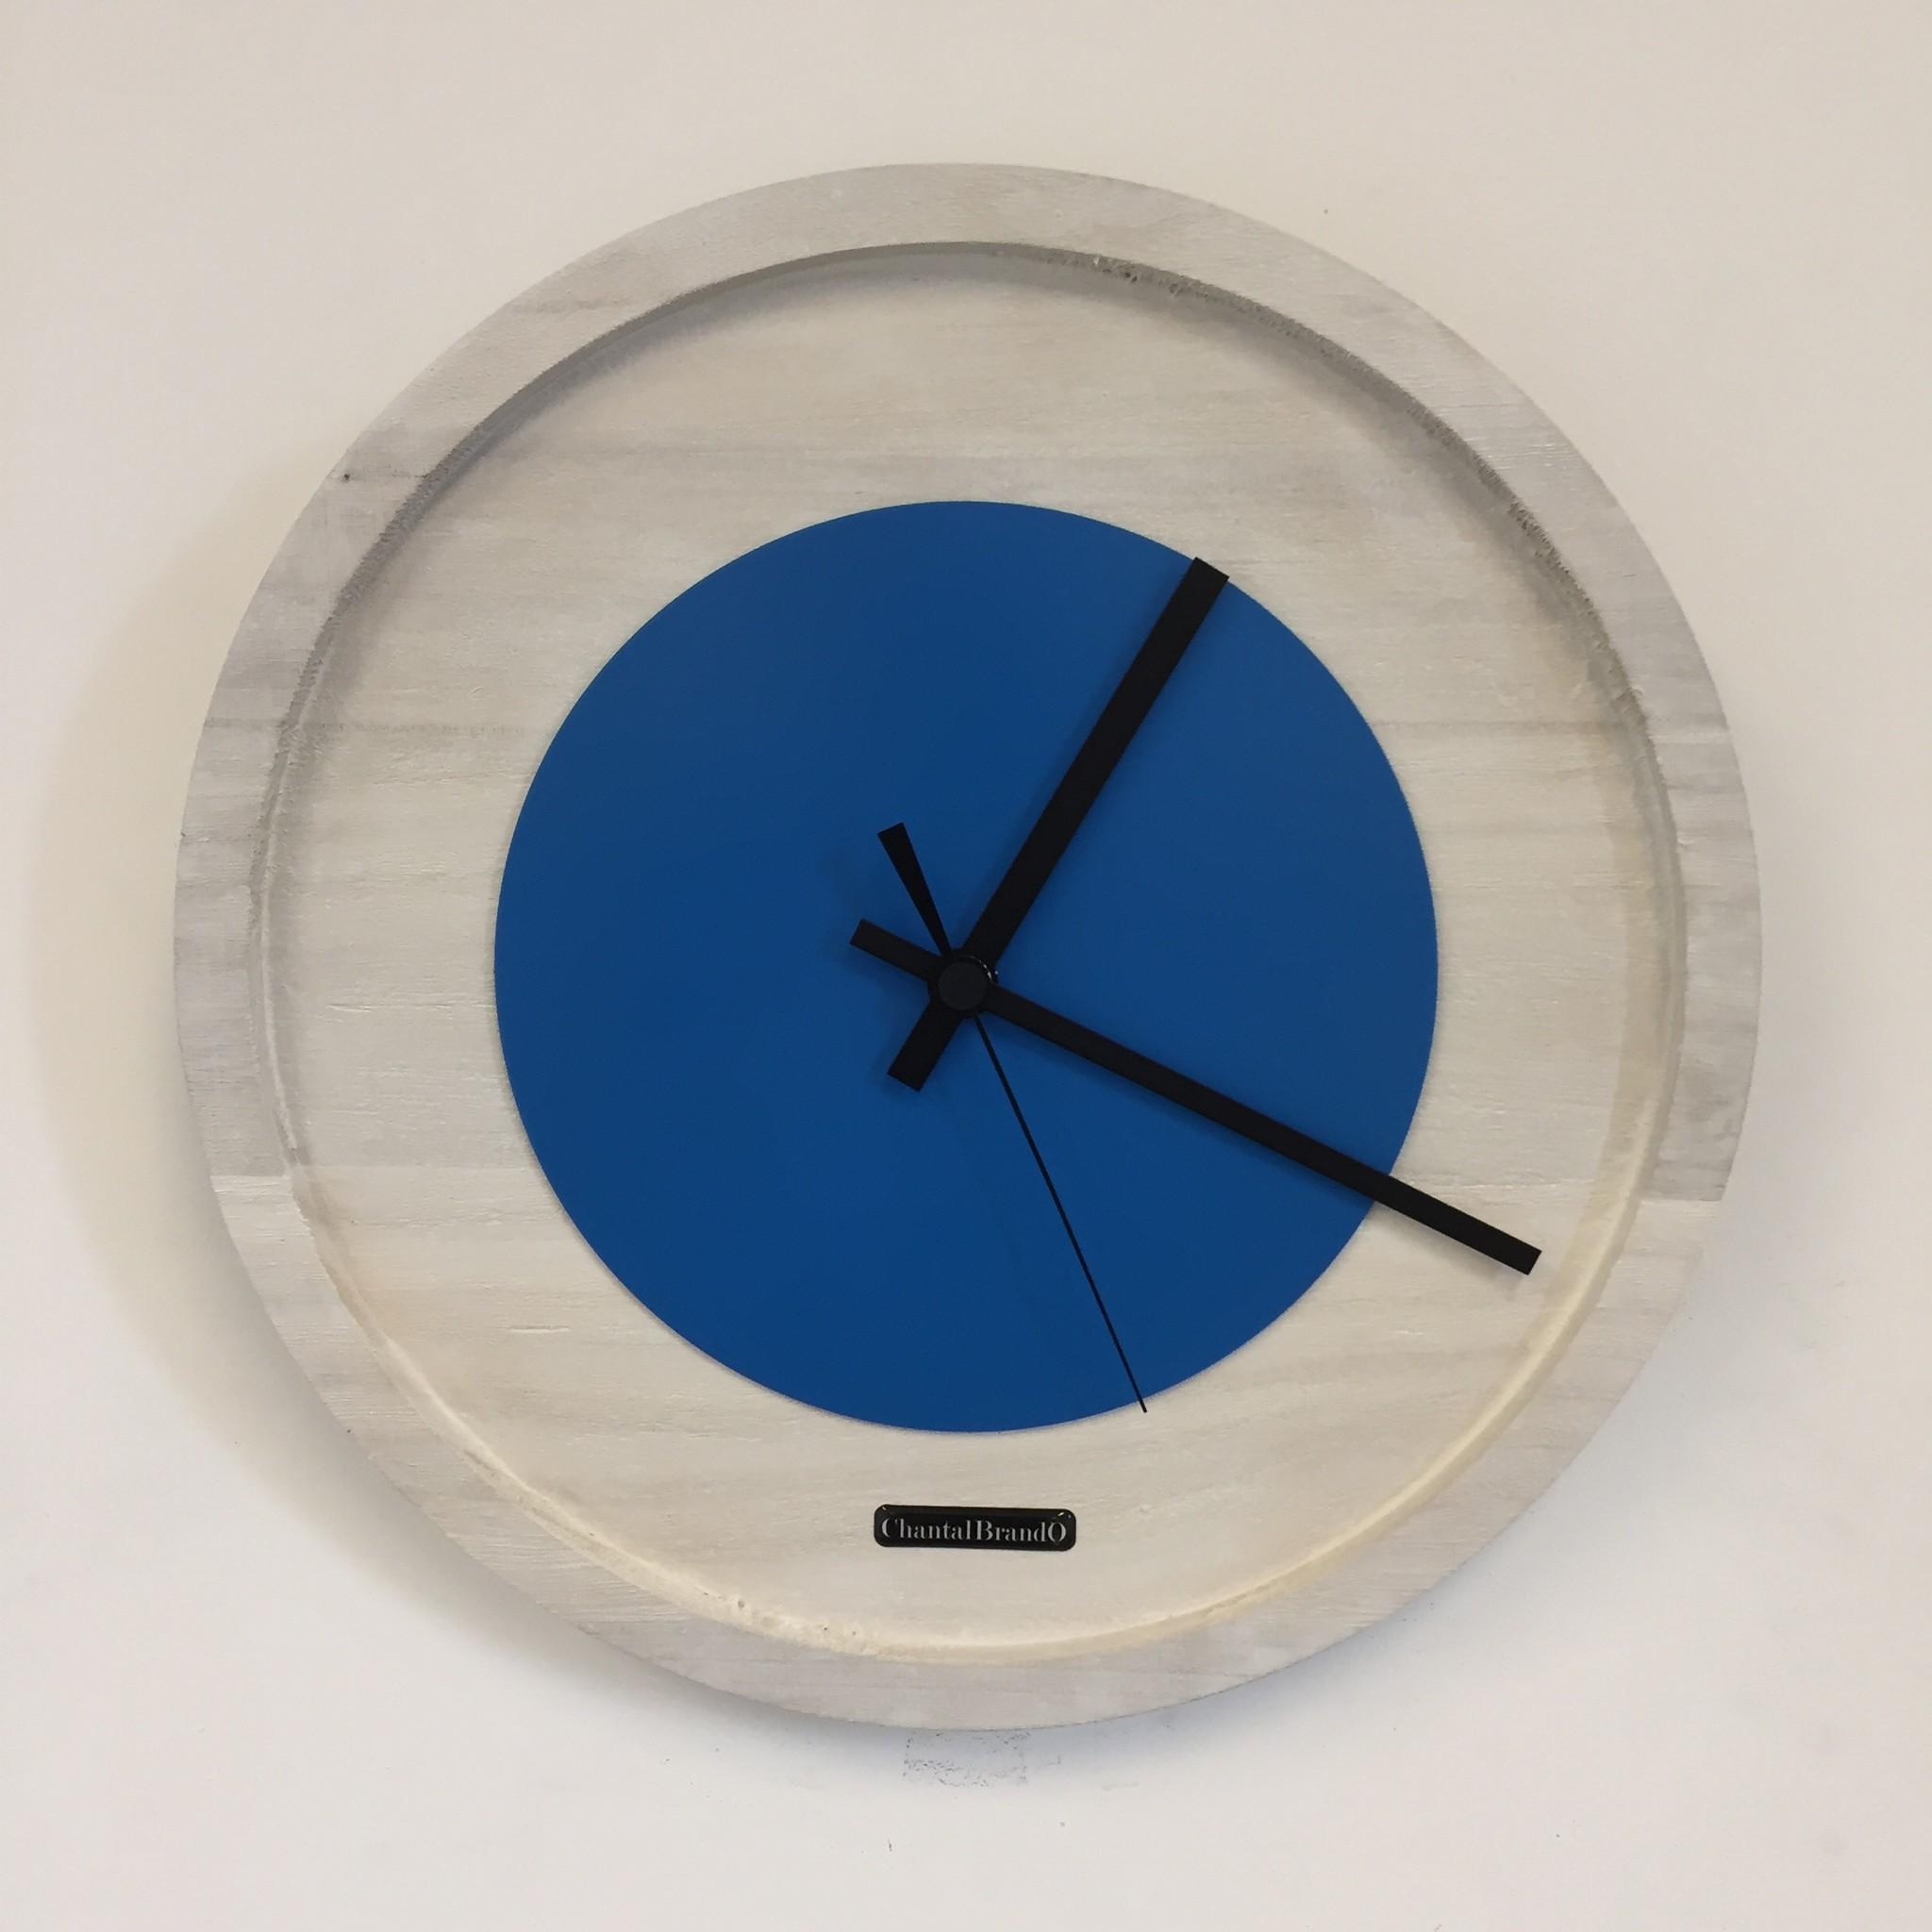 ChantalBrandO Wandklok Quinten White & Blue Modern Dutch Design